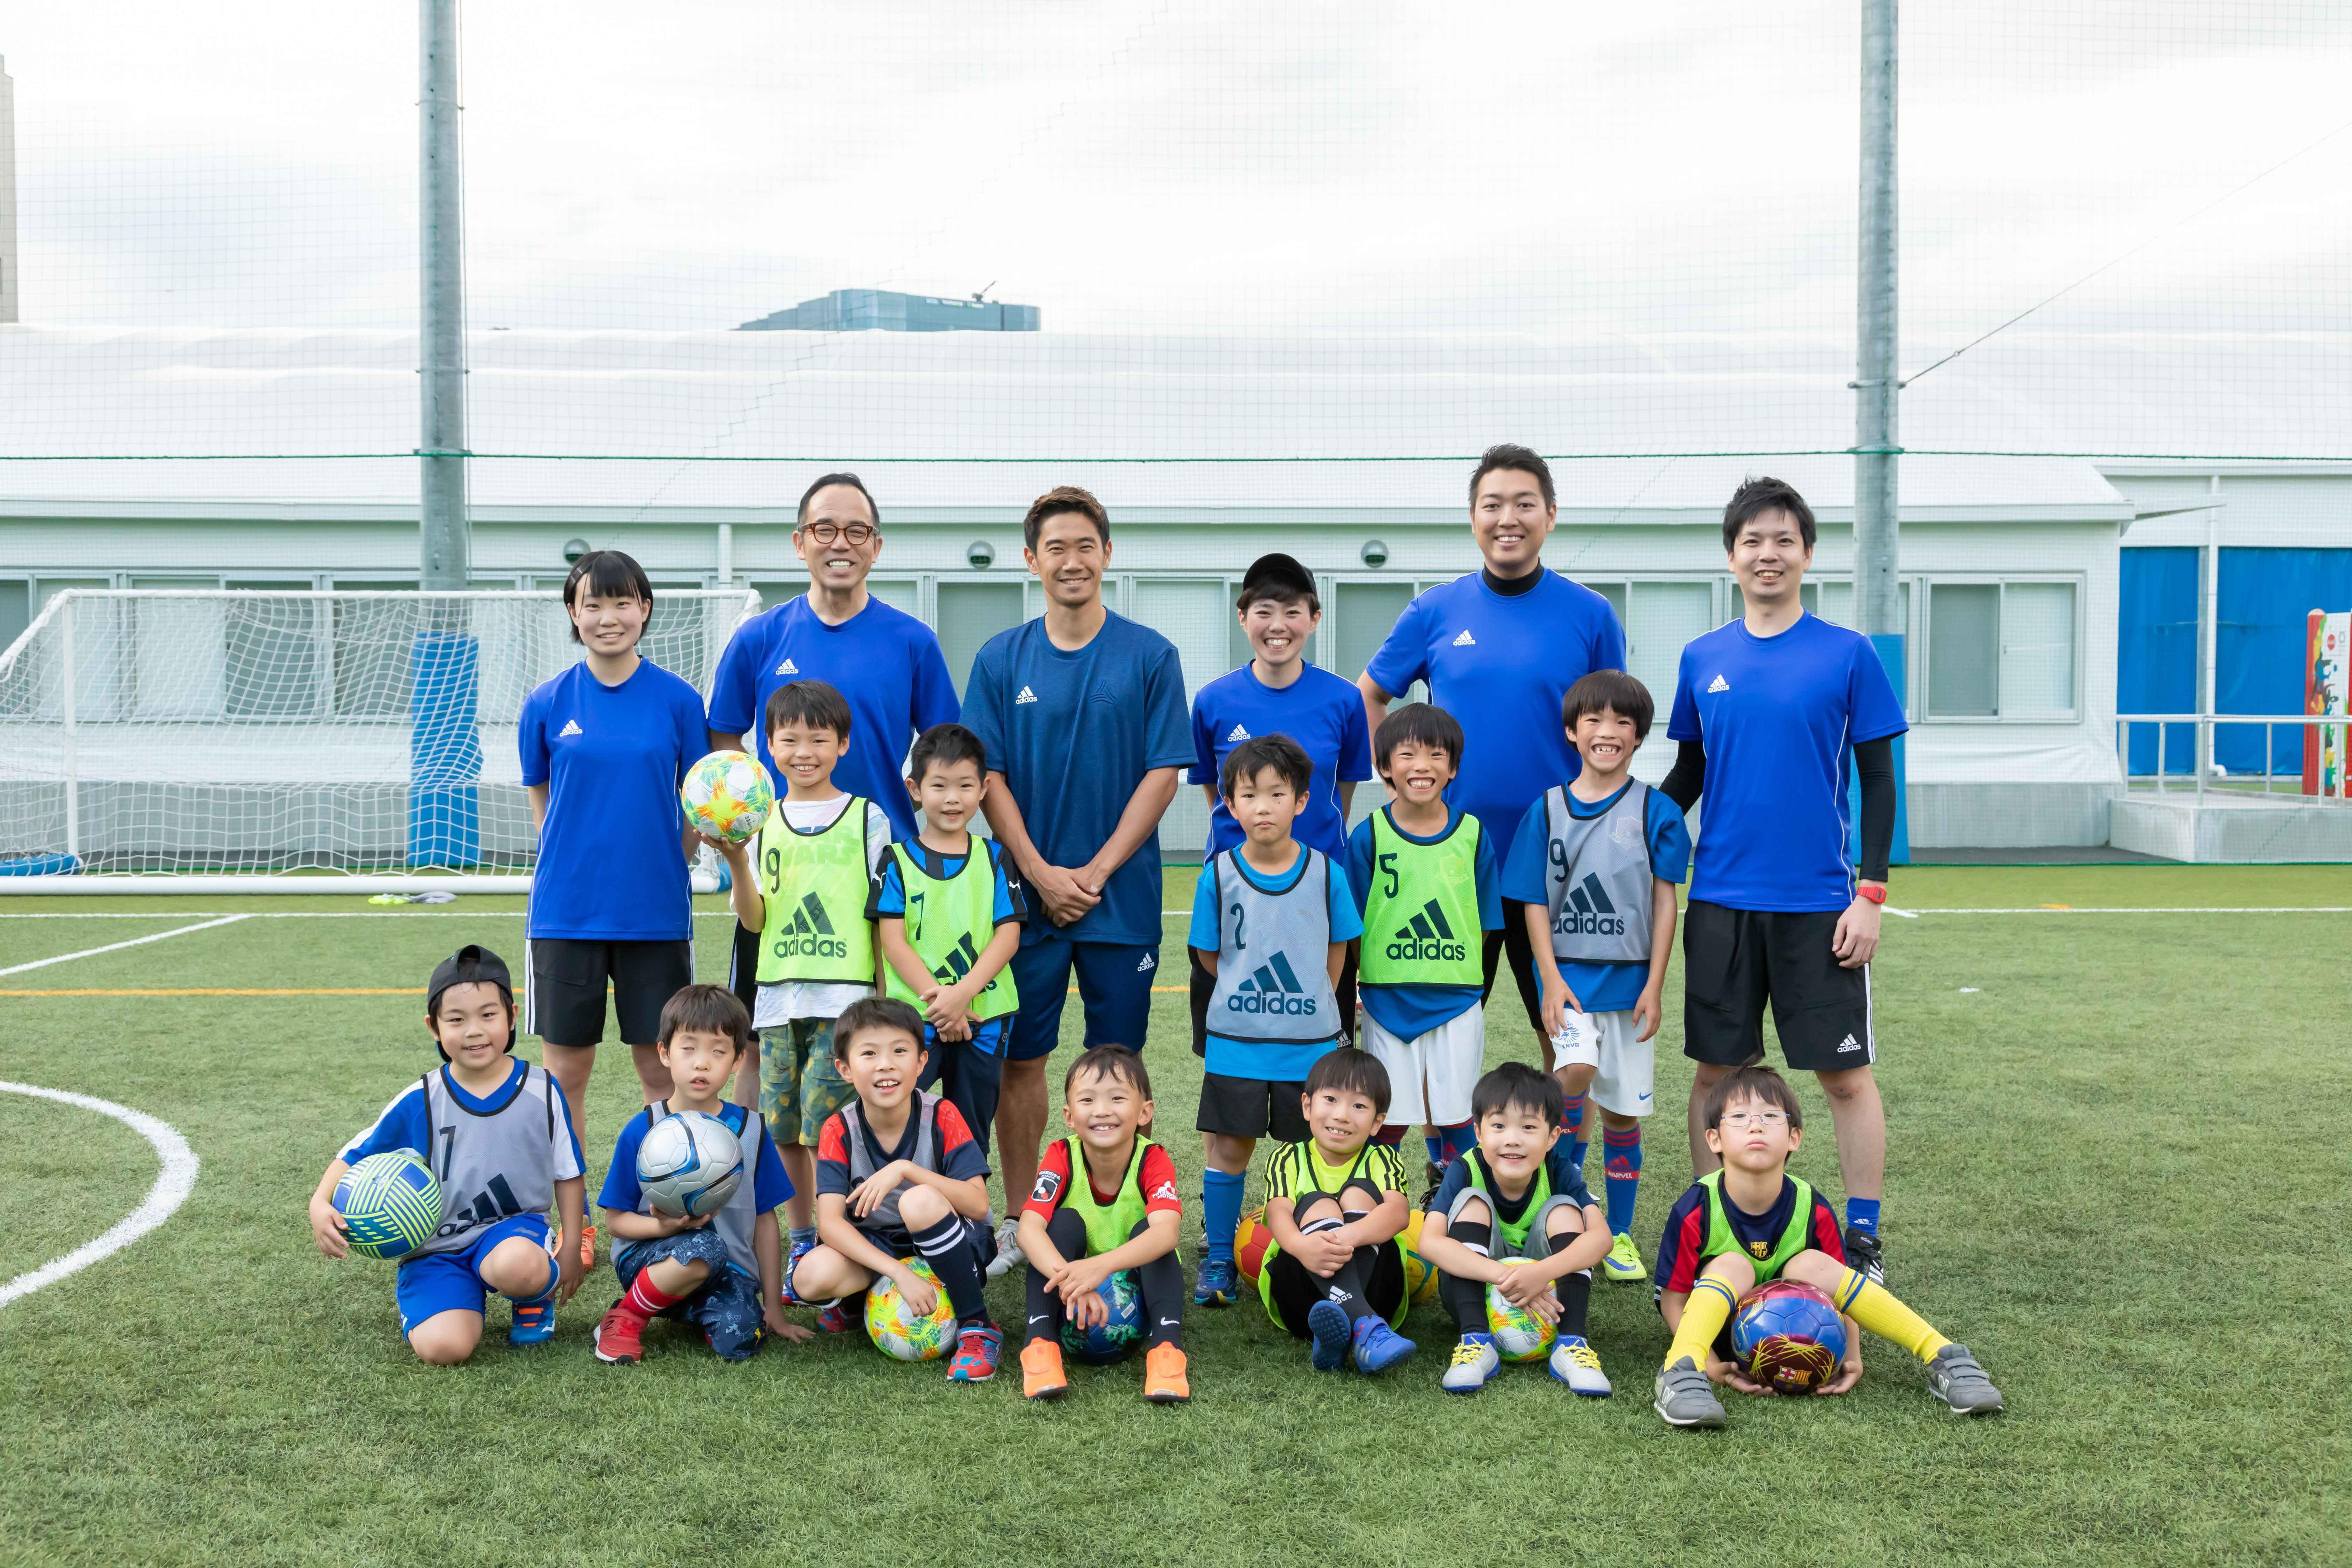 Hanaspoサッカー教室 横浜校